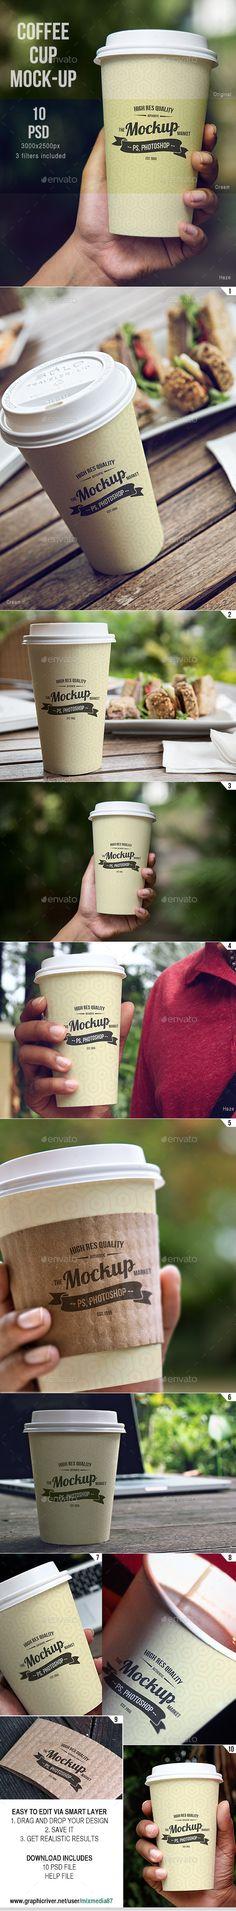 Coffee Cup Mockup | #coffeecupmockup #mockup | Download: http://graphicriver.net/item/coffee-cup-mockup/8861003?ref=ksioks